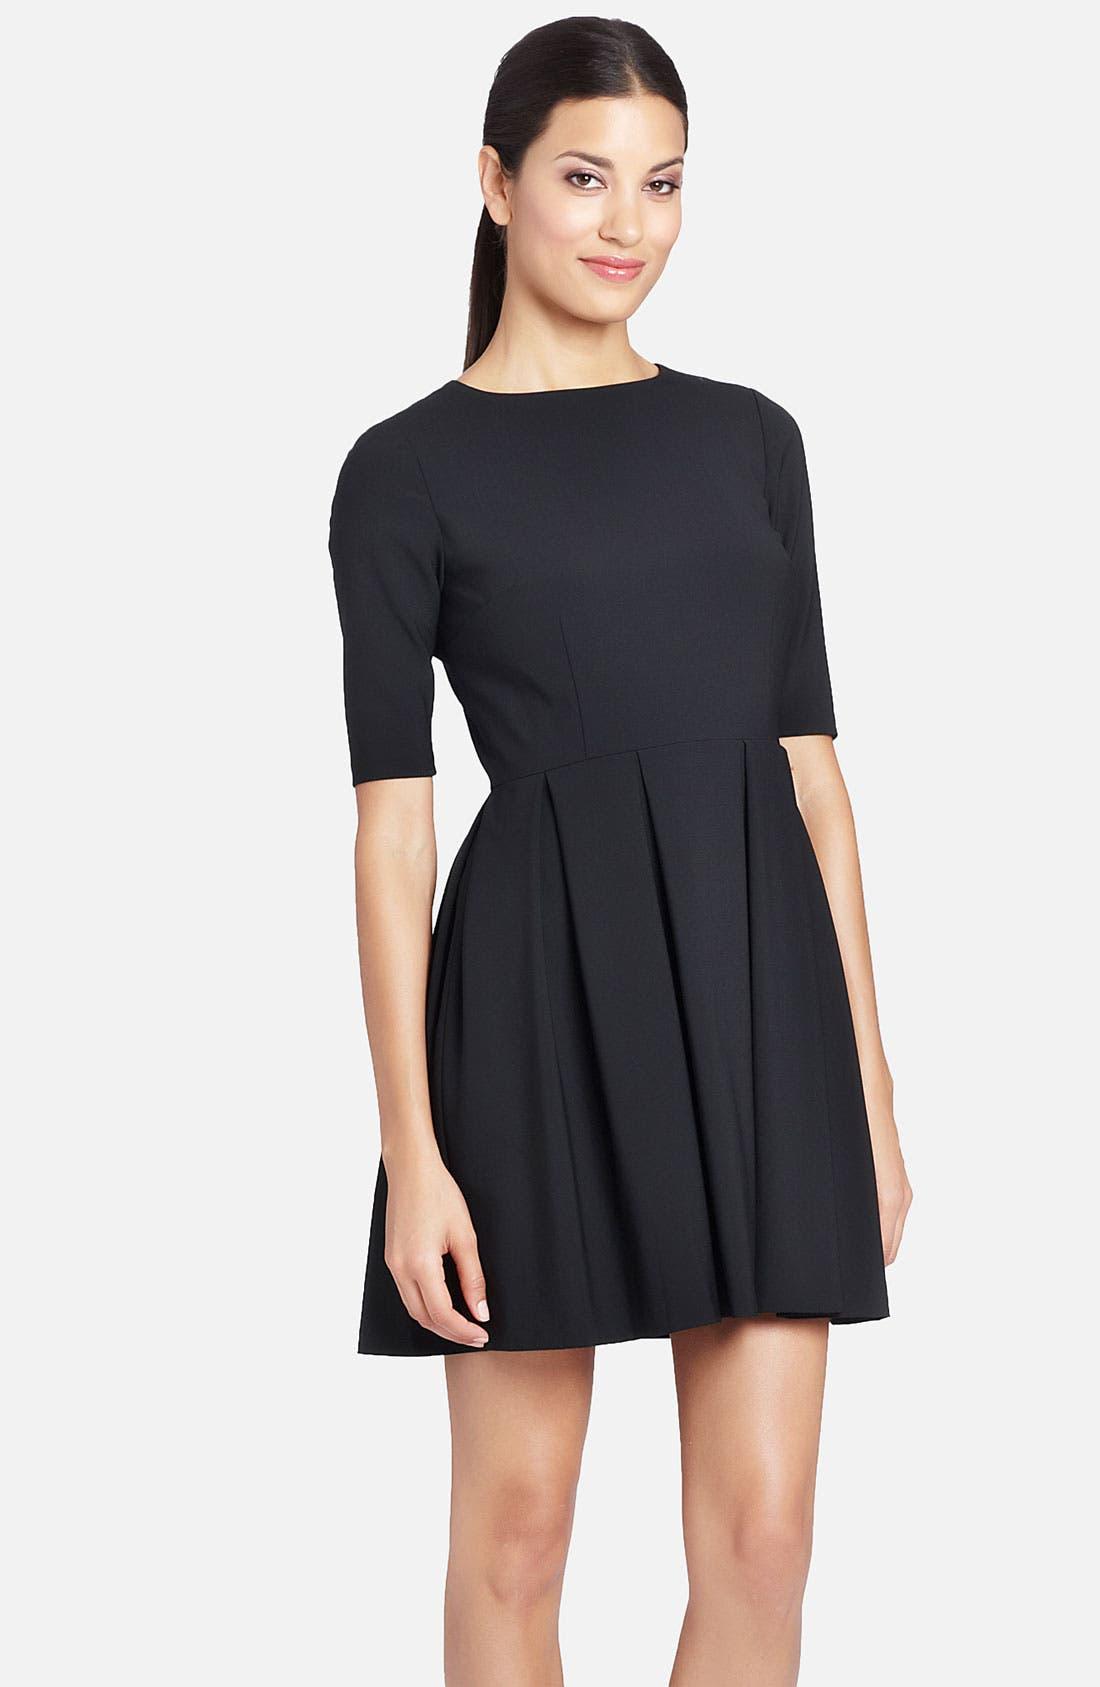 Main Image - Cynthia Steffe 'Marietta' Pleated Skirt Fit & Flare Dress